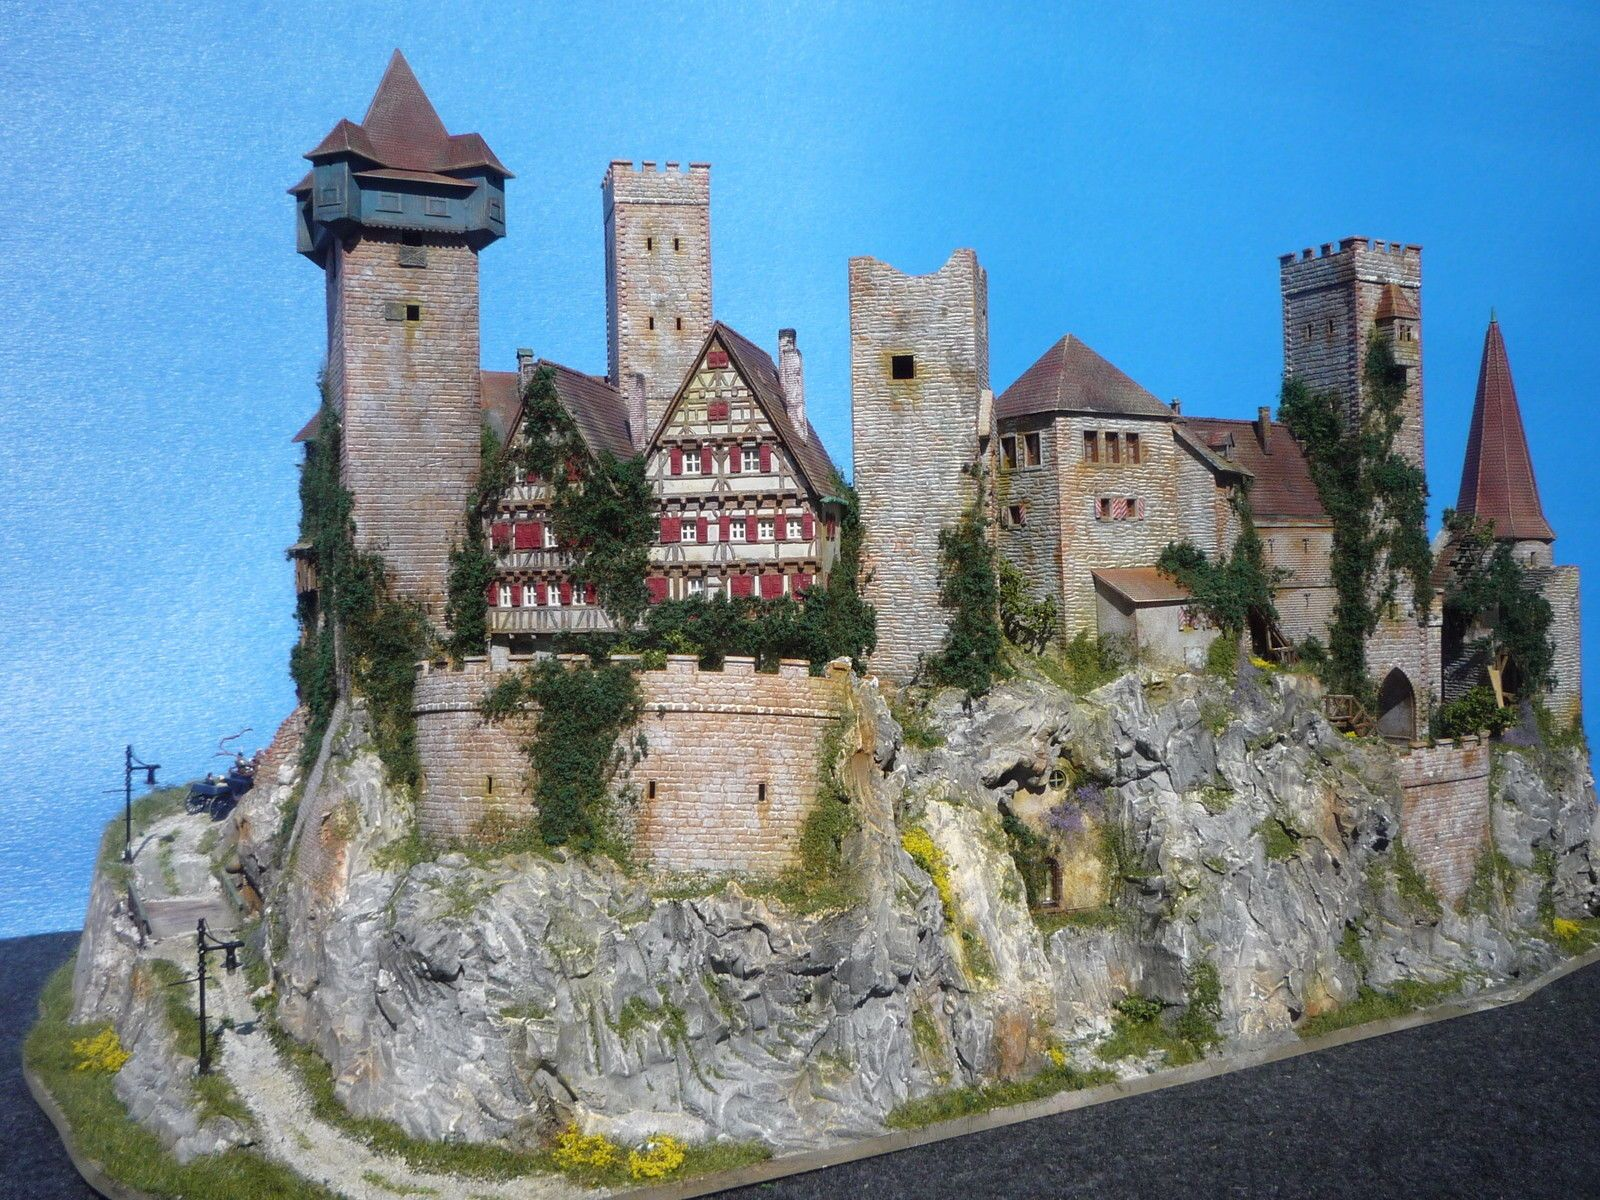 Diorama castle burg schloss elbenwald patiniert for Kutsche playmobil